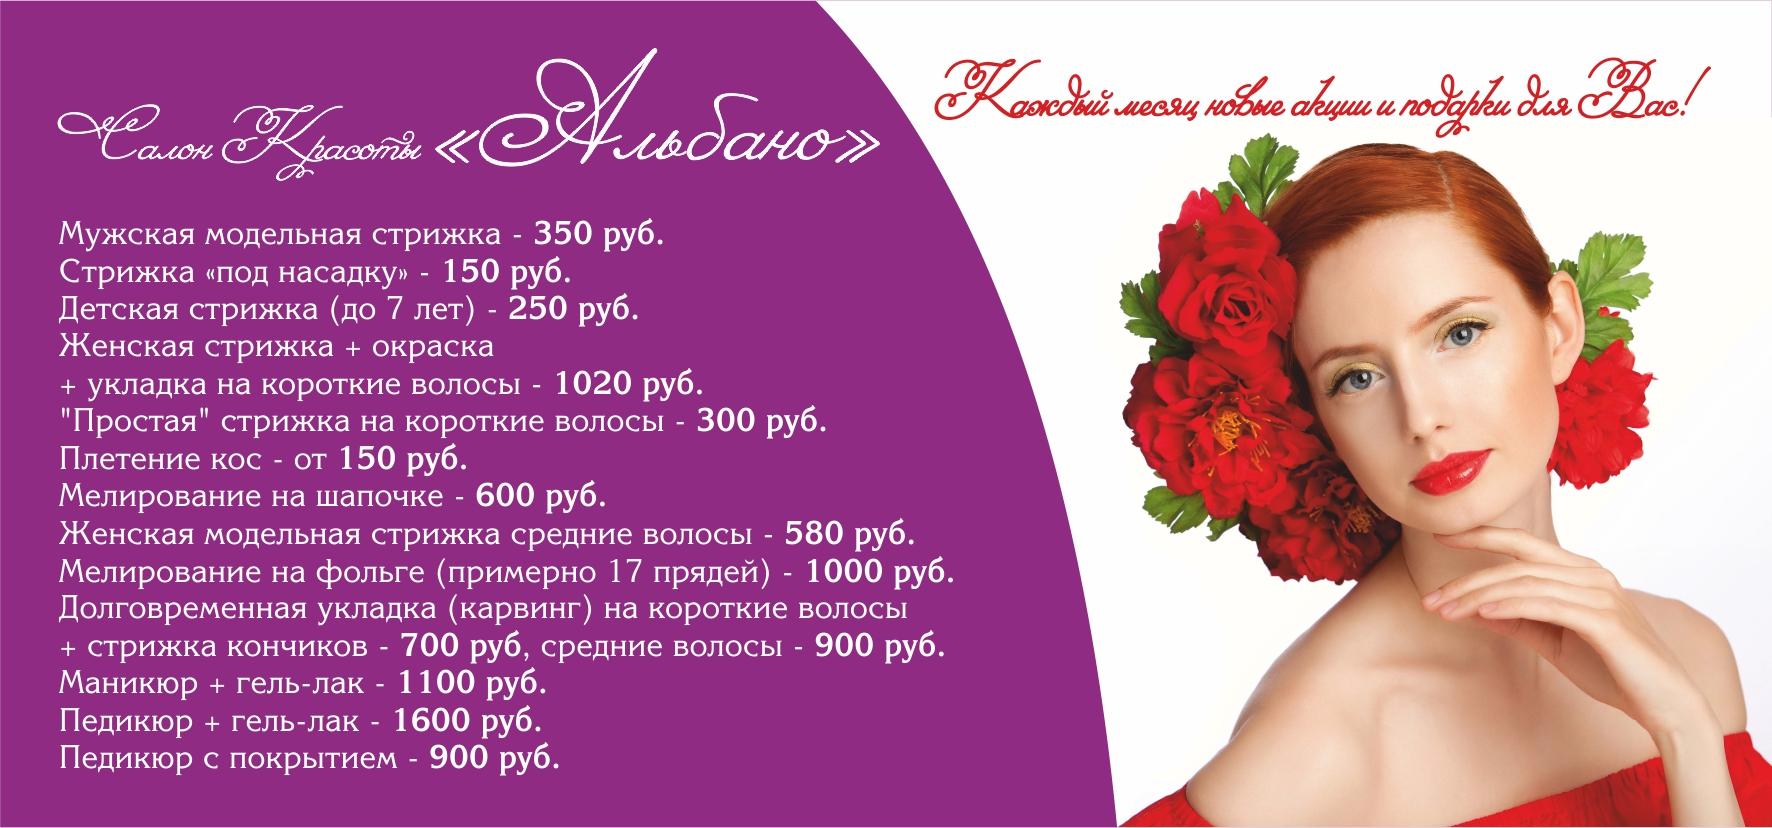 Салон красоты Альбано: отзывы и цены салонов красоты